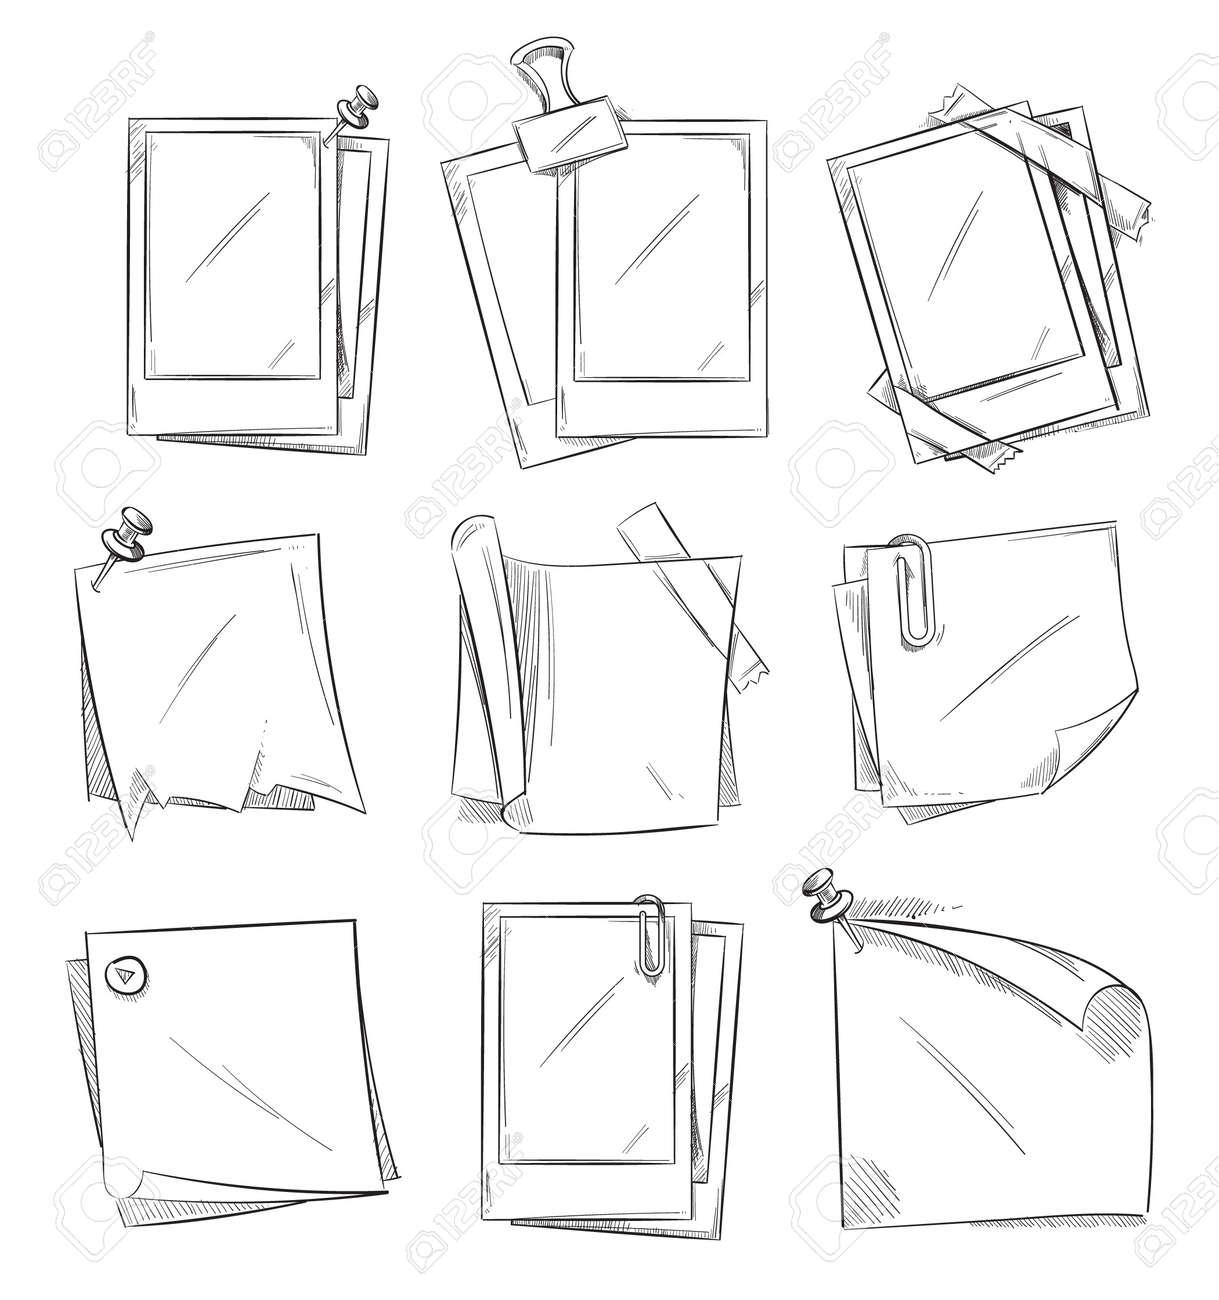 Blank vintage photo frames and notepaper doodle sketch vector collection. - 165867083